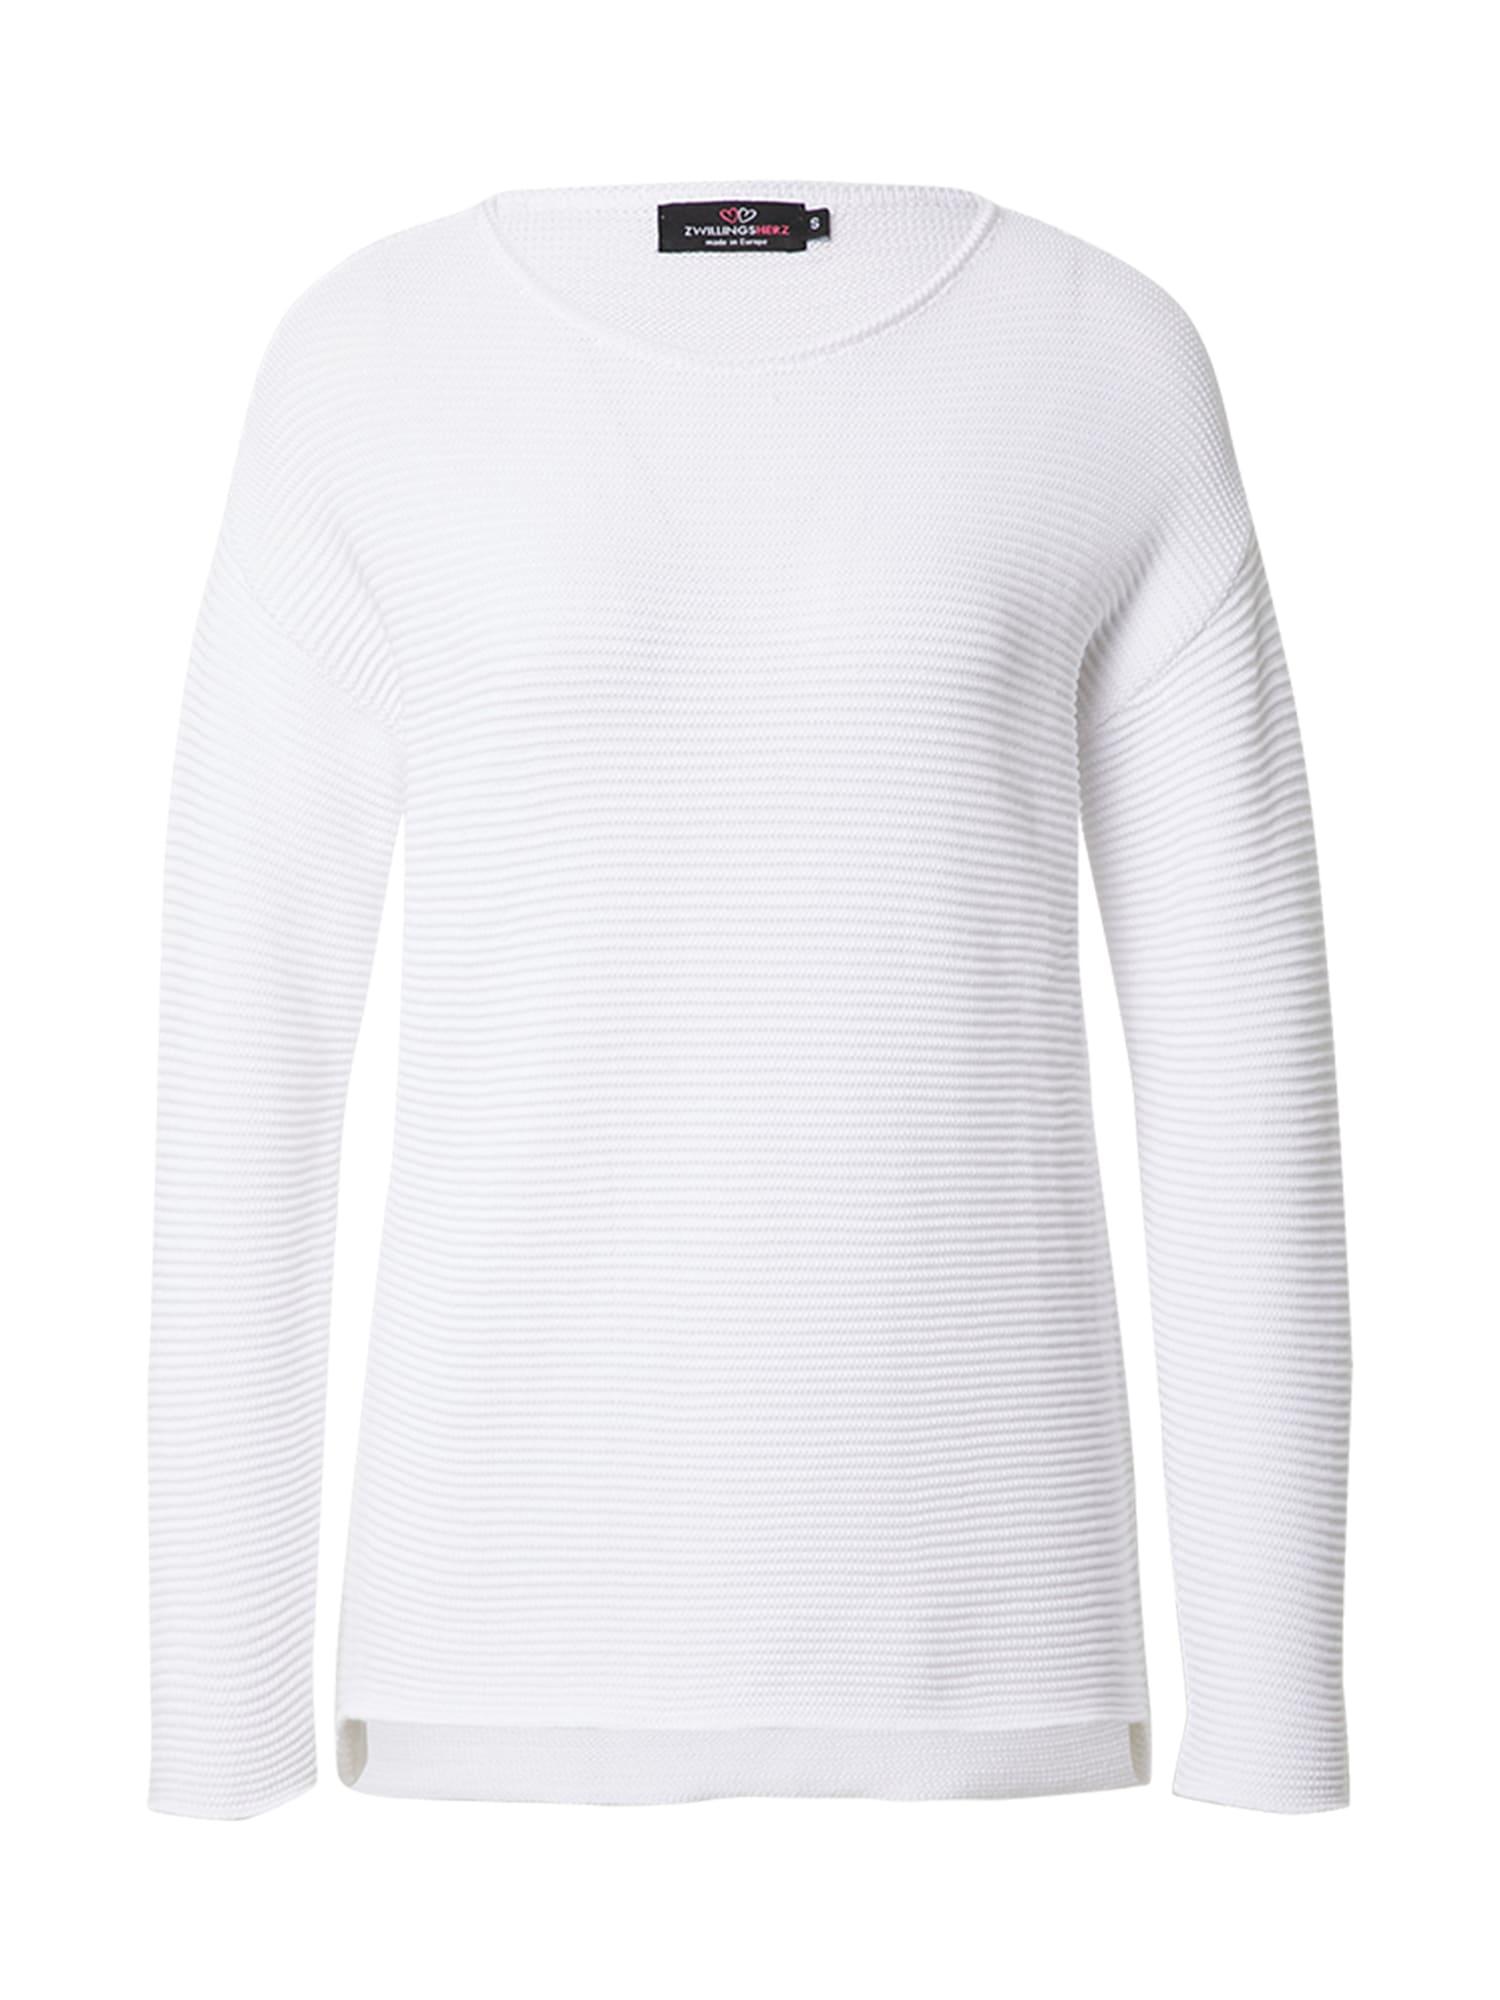 Zwillingsherz Megztinis natūrali balta